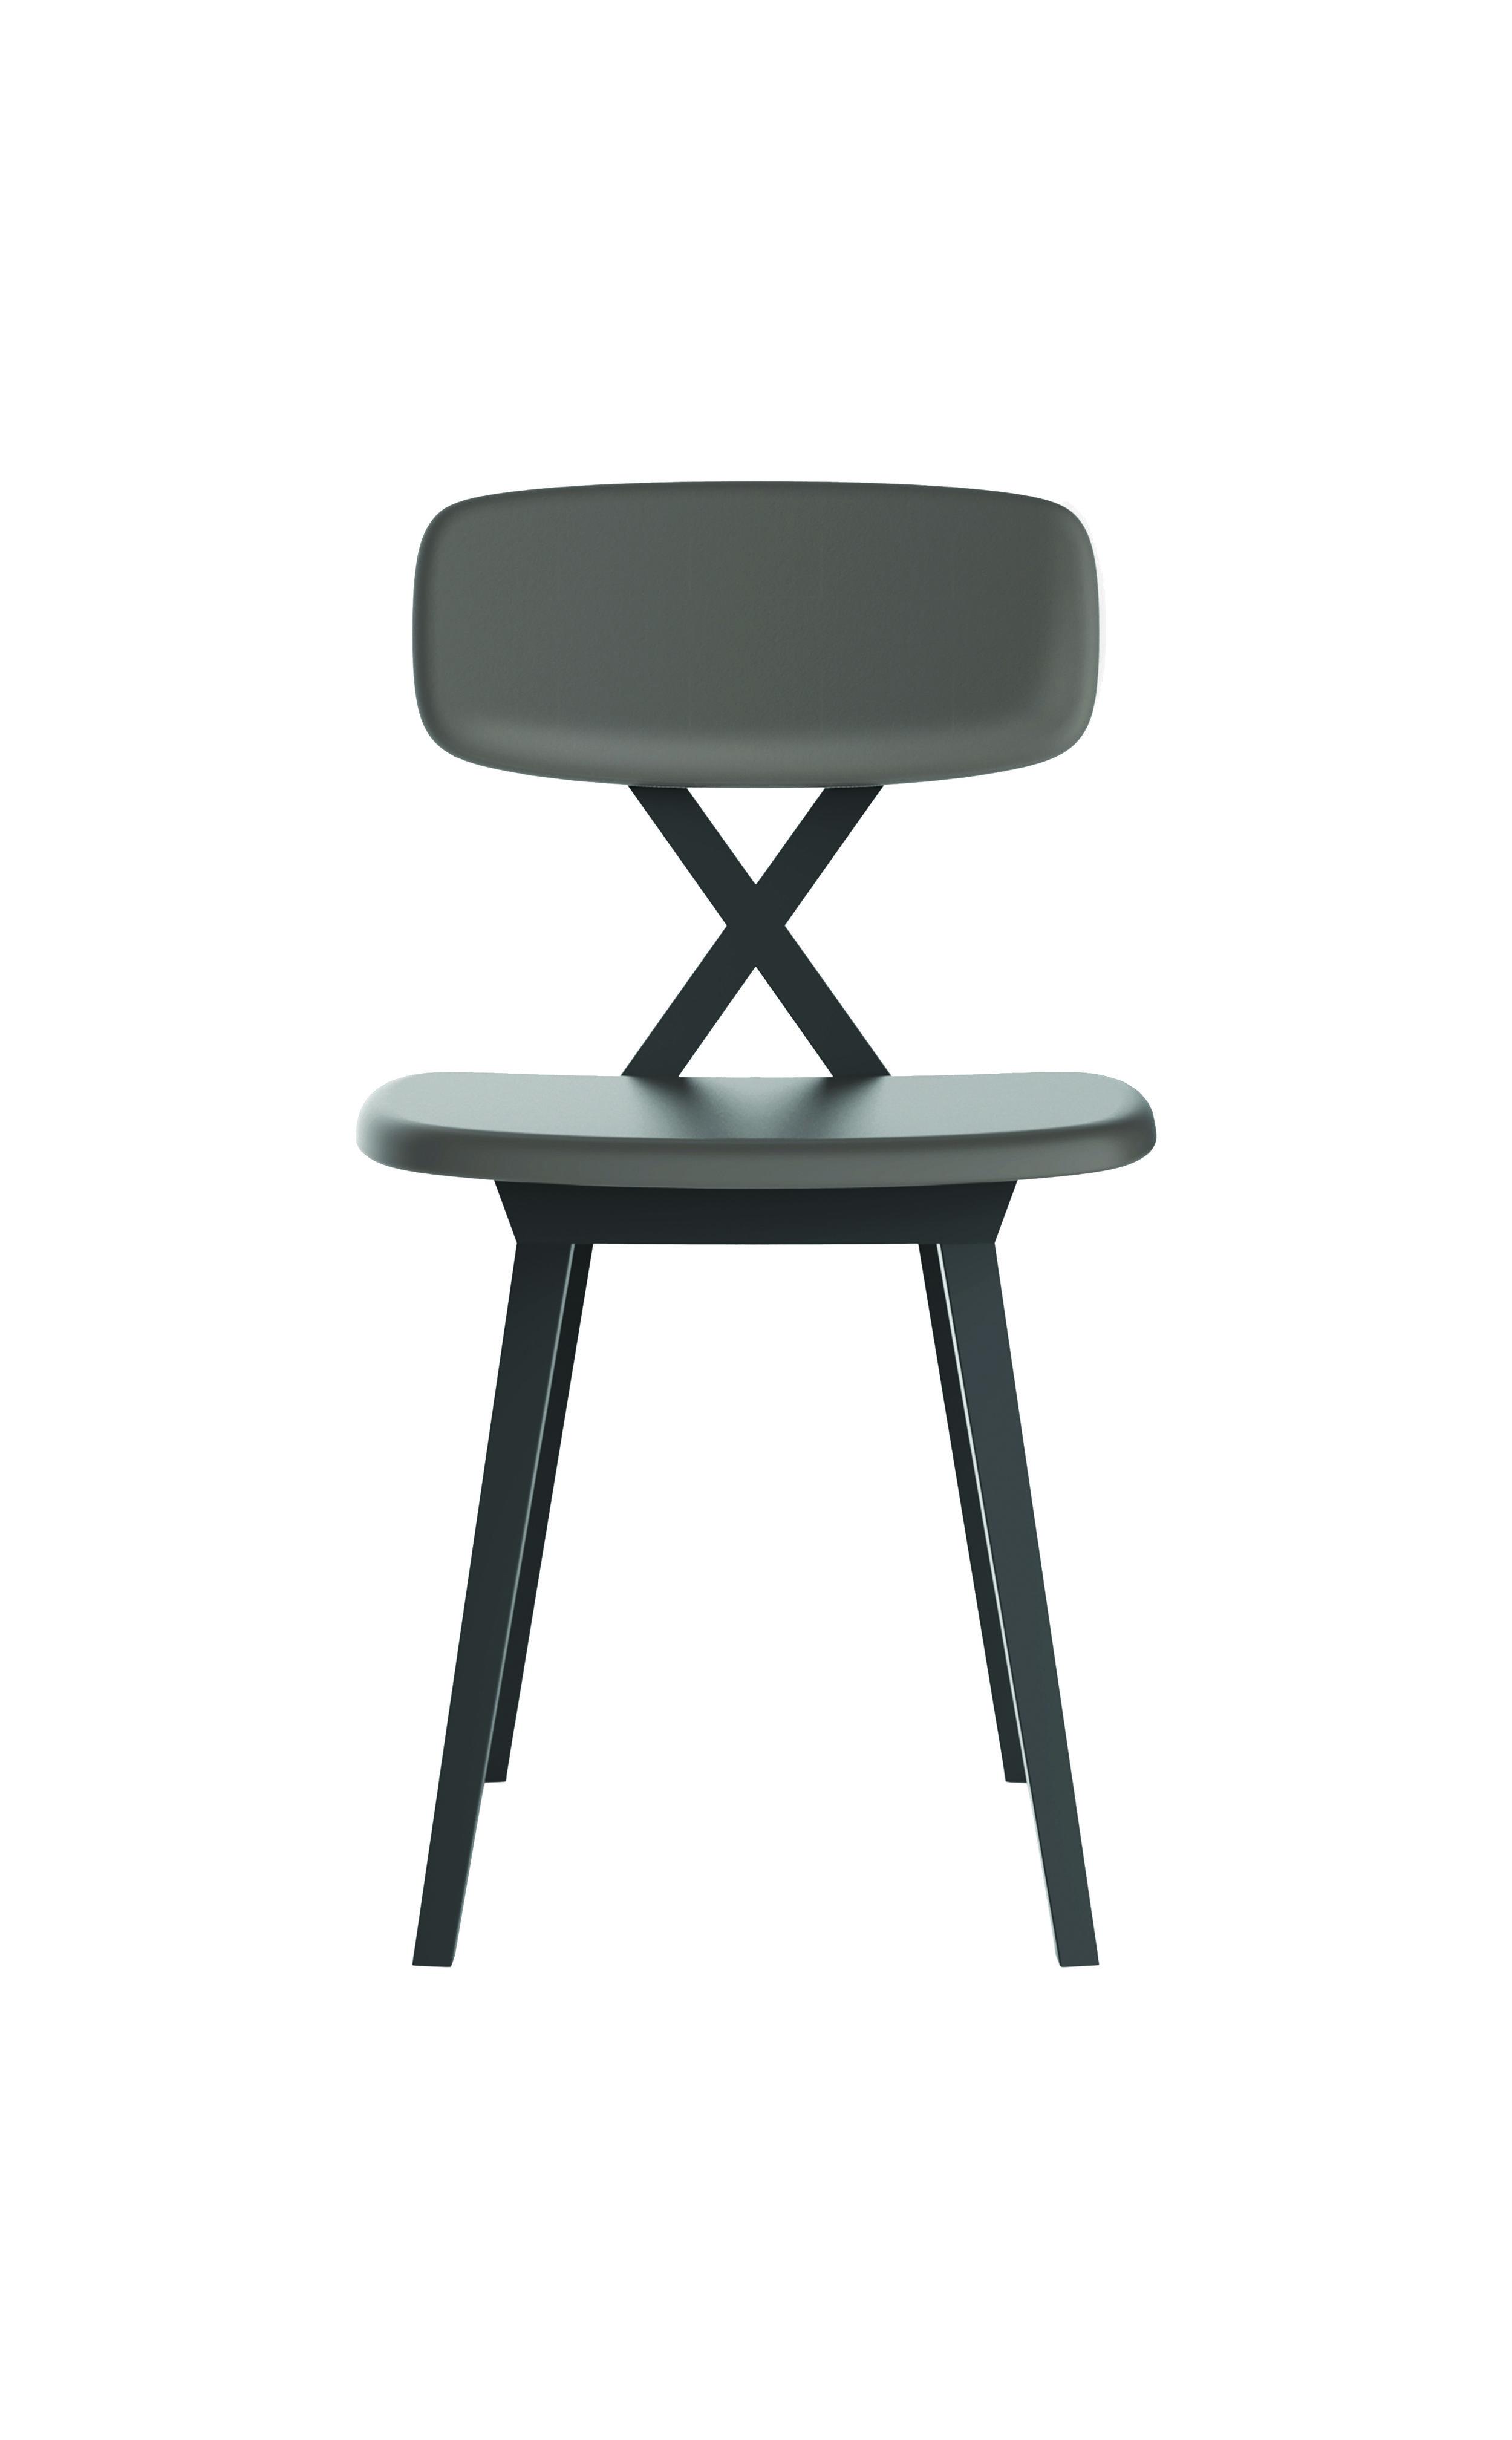 02-qeeboo-x-chair-with-cushion-by-nika-zupanc-dove-grey.jpg